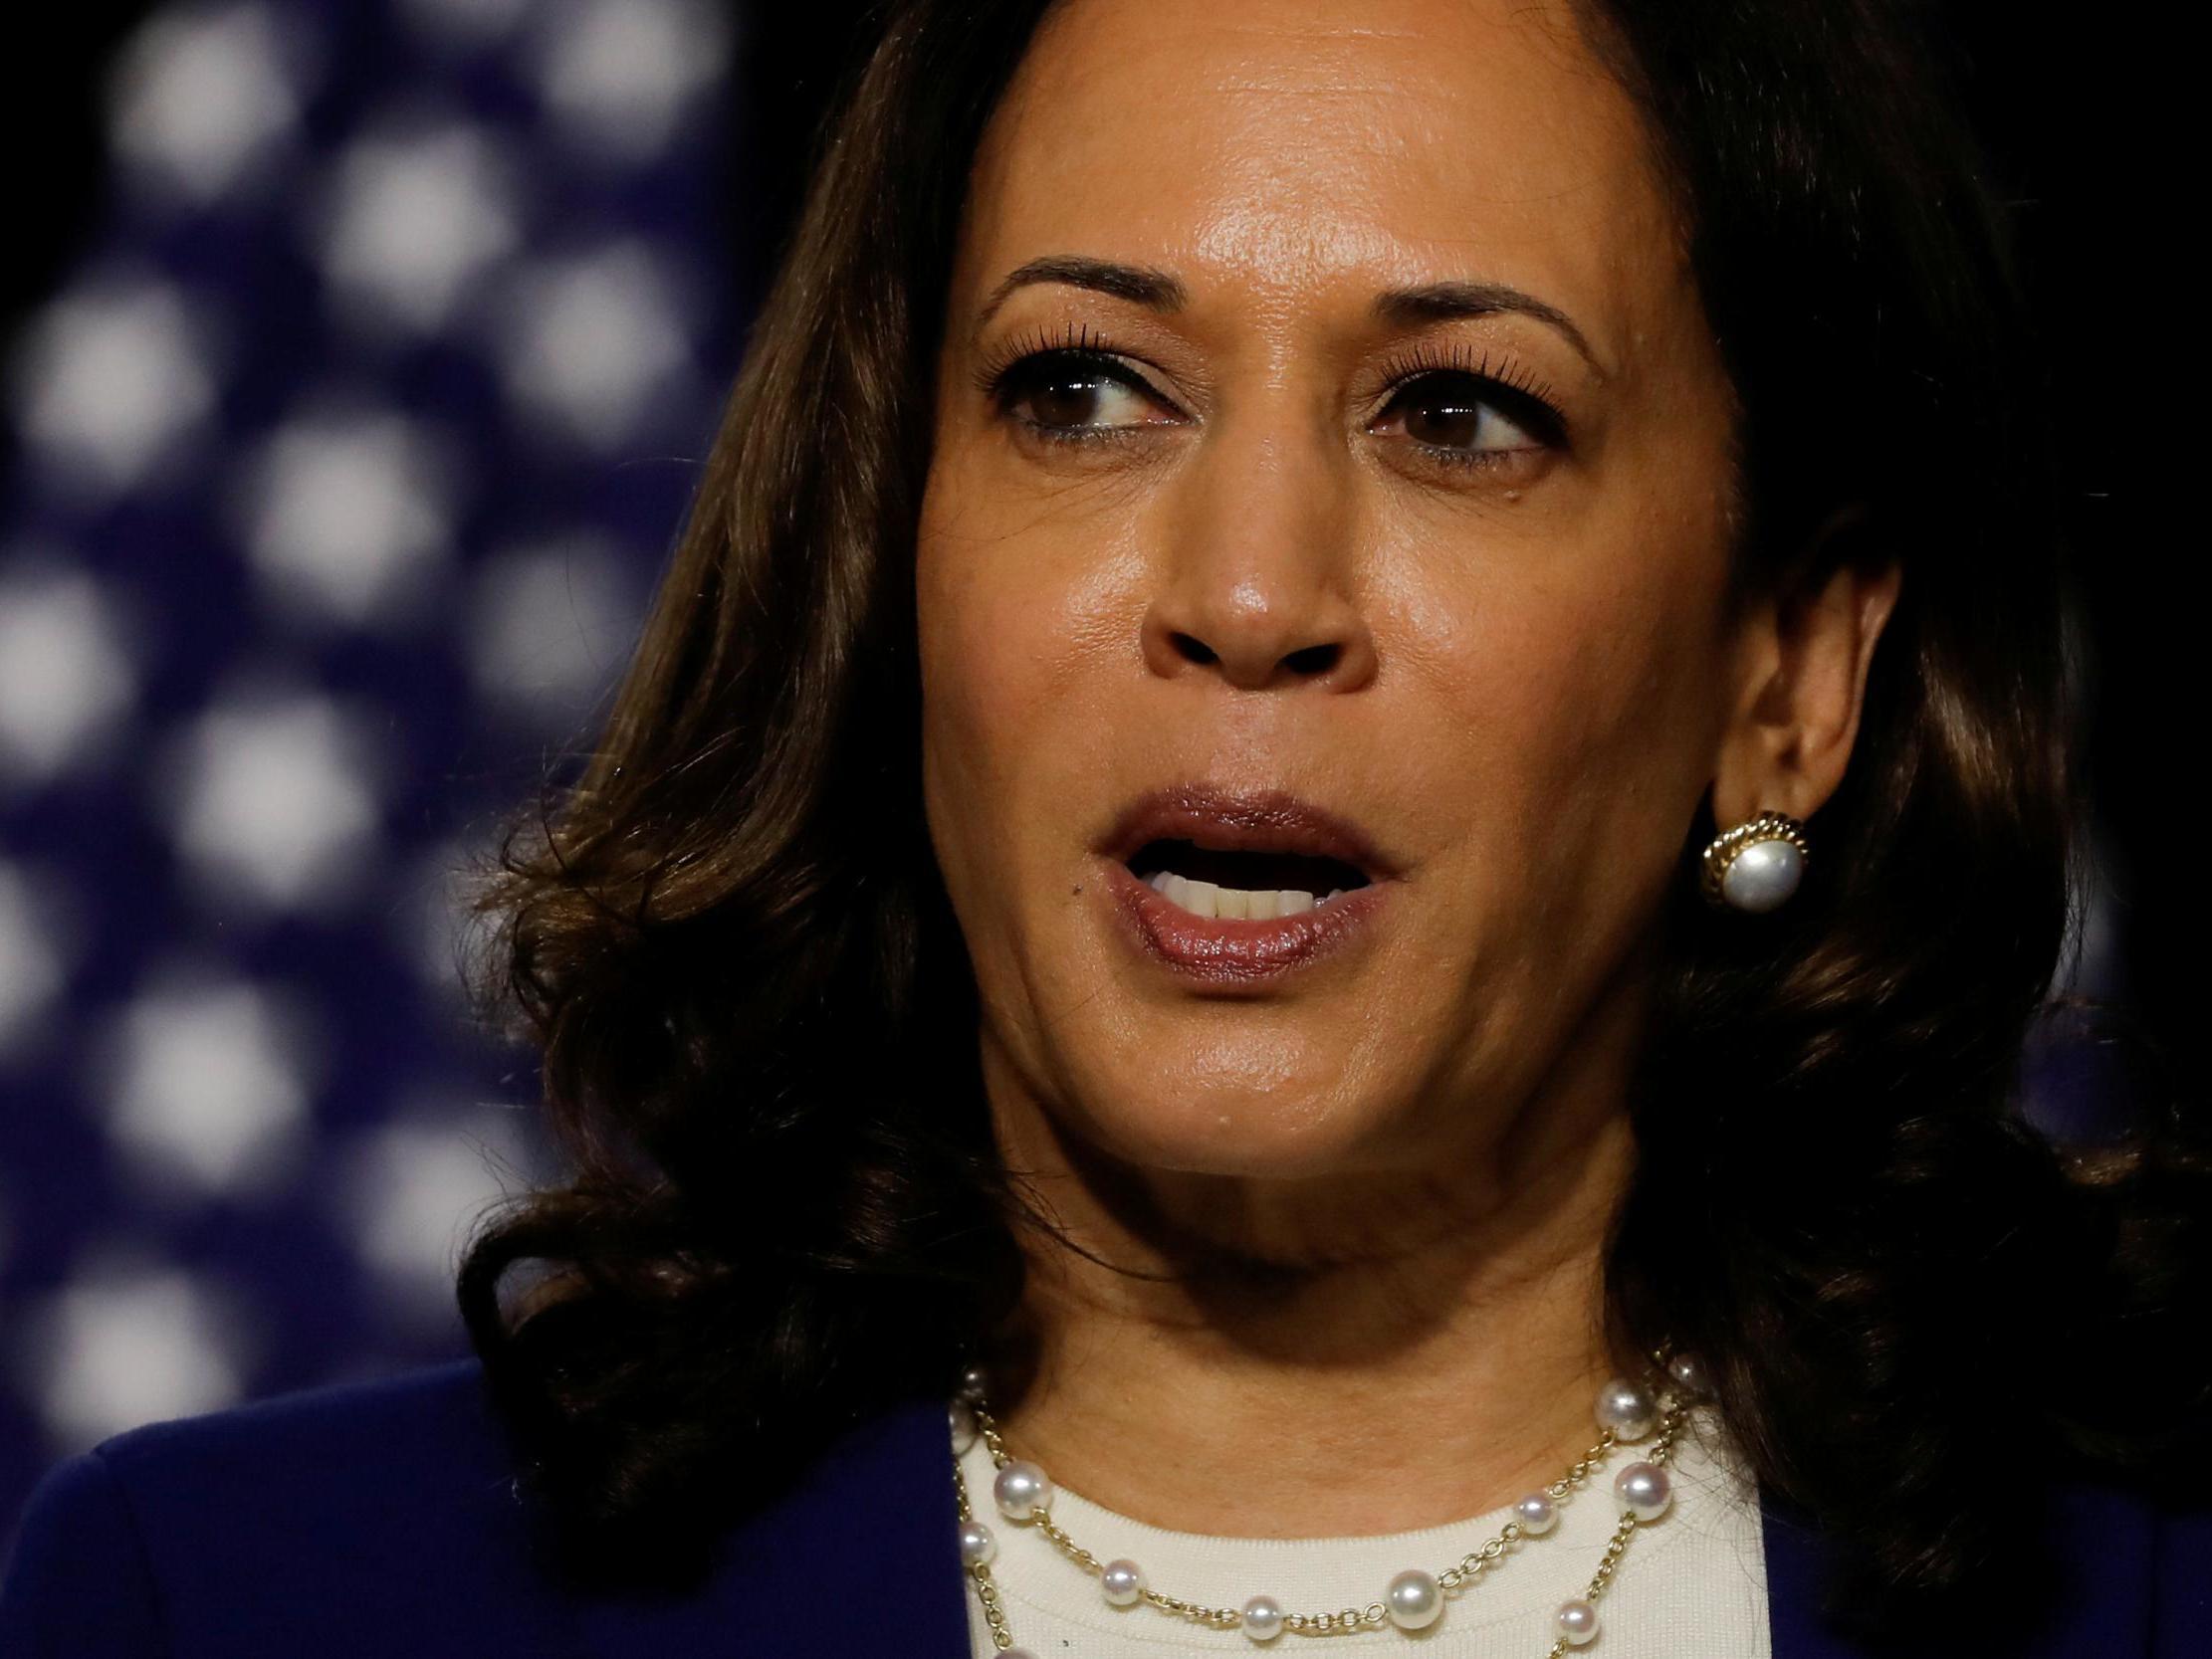 Virginia mayor apologies for calling Kamala Harris 'Aunt Jemima'